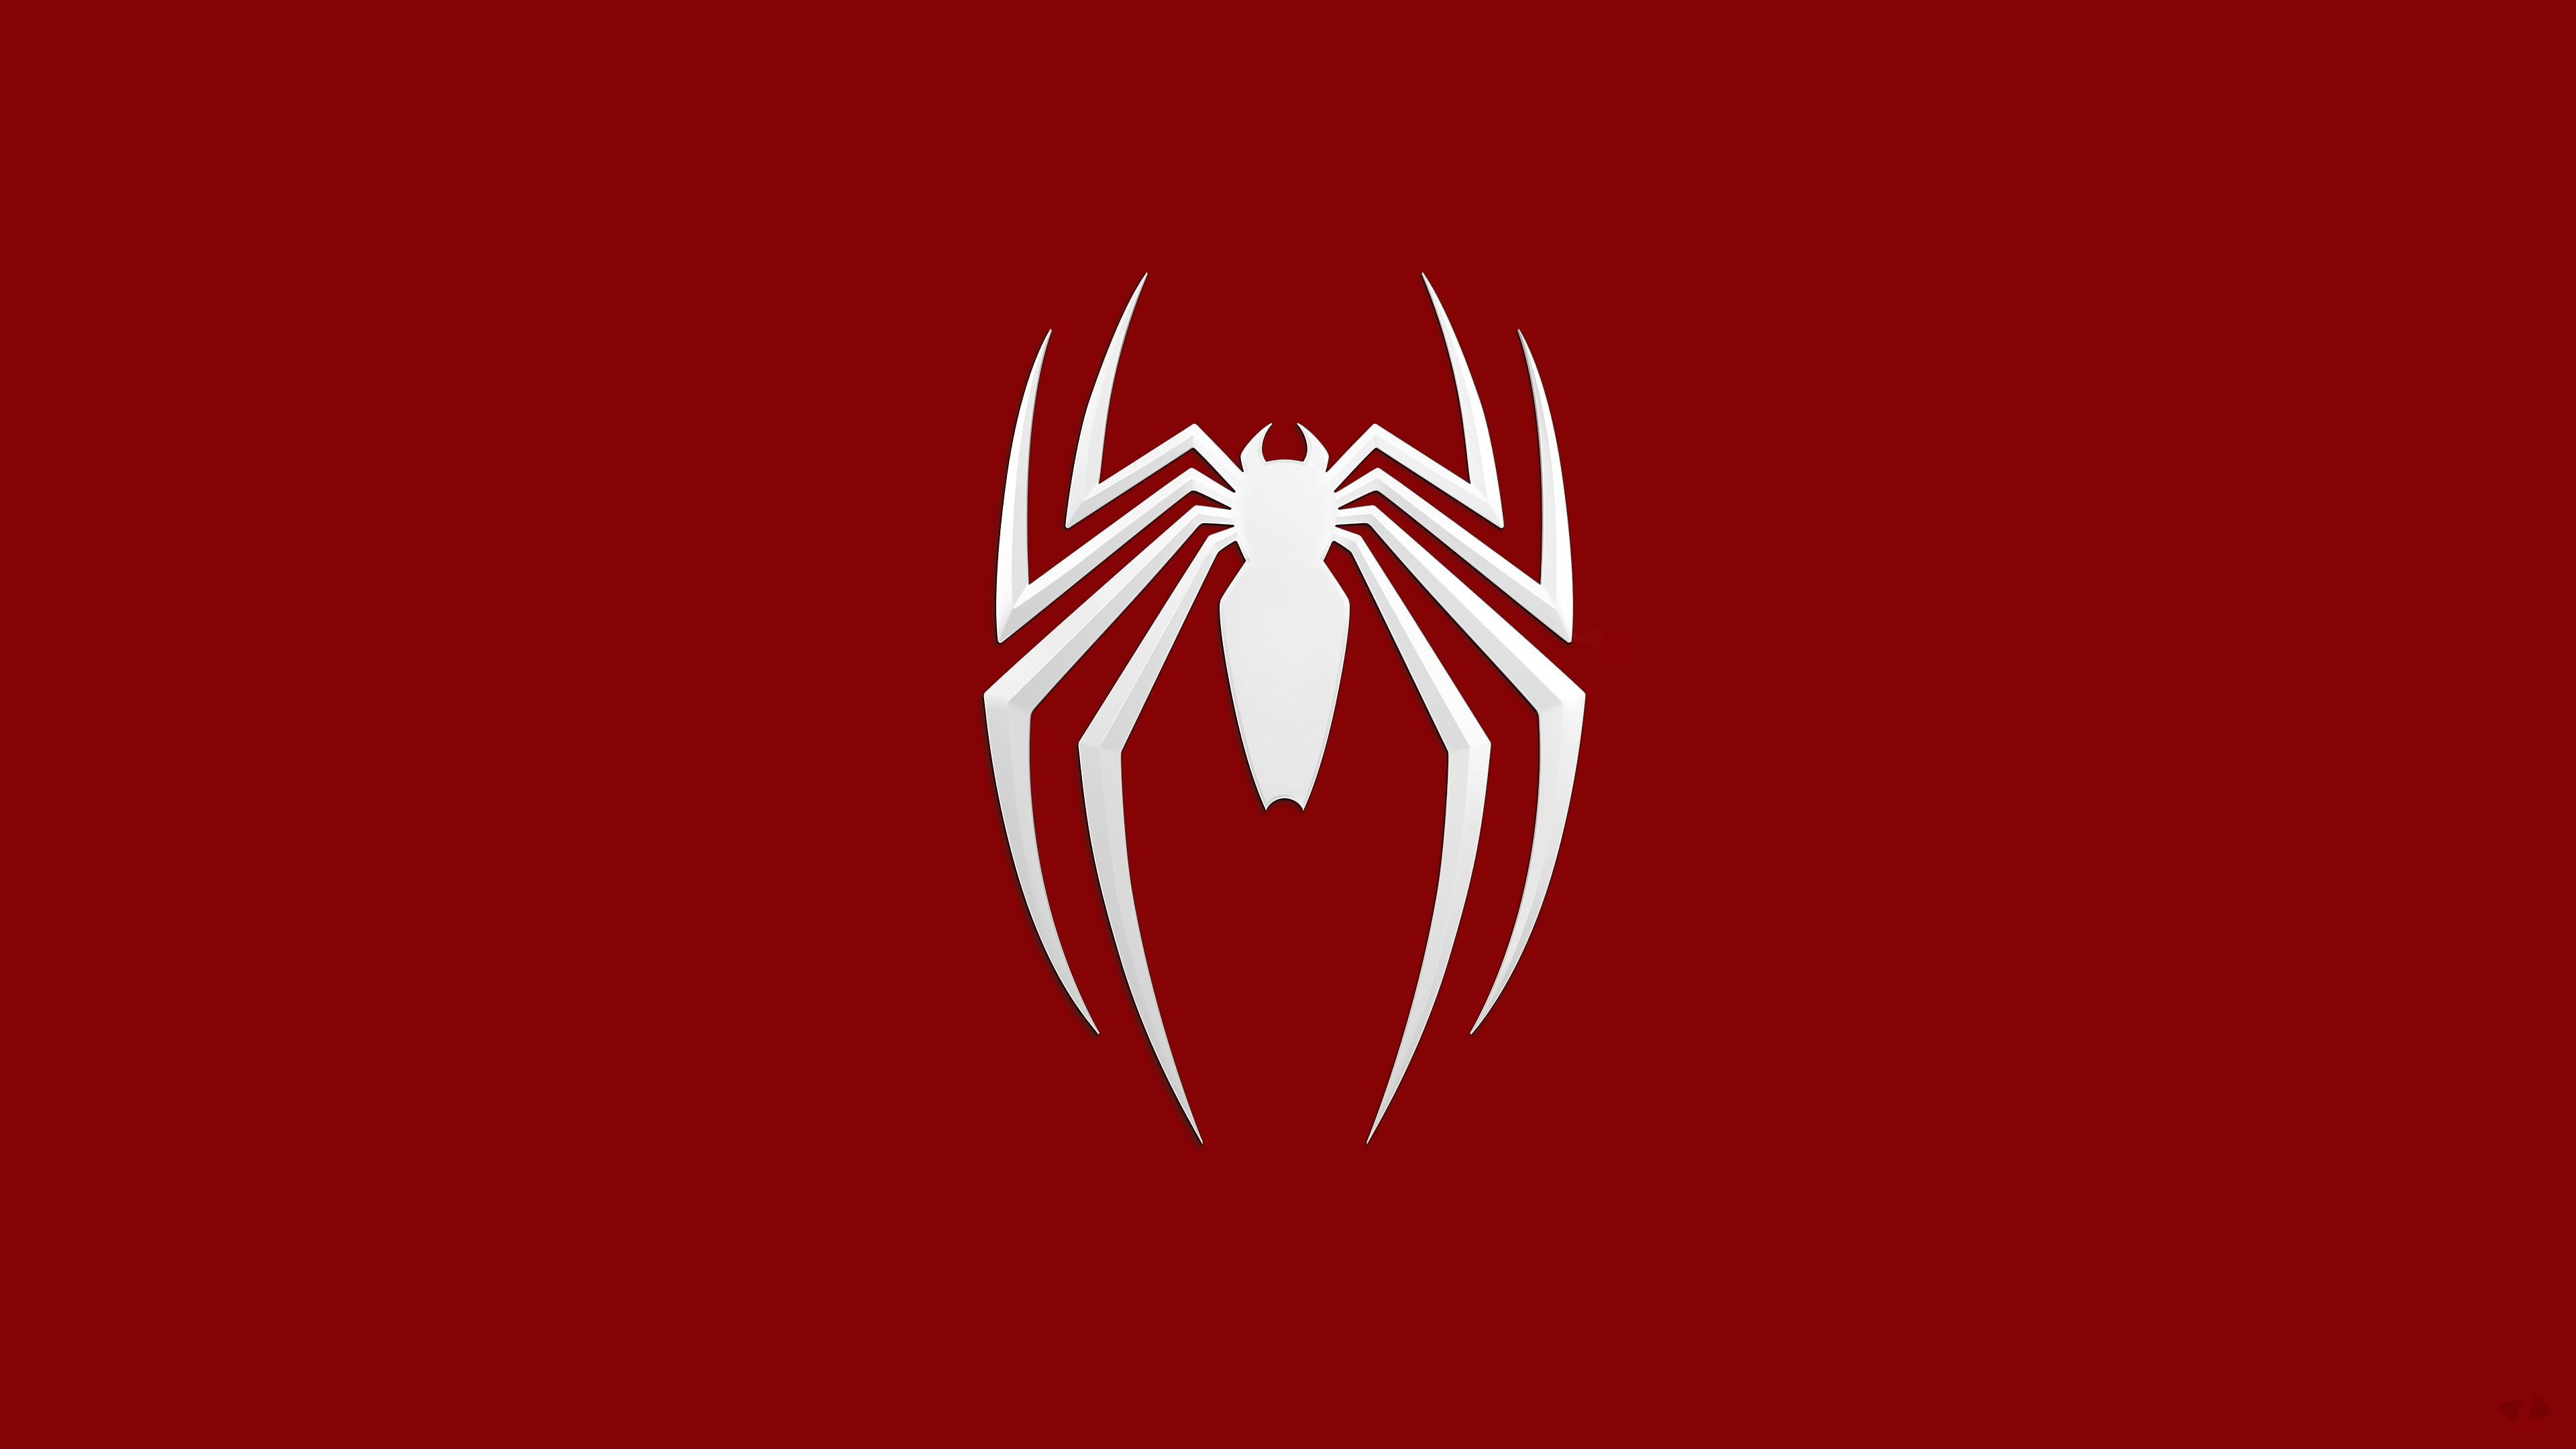 Marvel Spider Man Logo Spider Man Logo Simple Background Spider Man 2018 Marvel Comics 4k Wallpaper Hdwallpaper Desk Spider Man 2018 Spiderman Man Logo